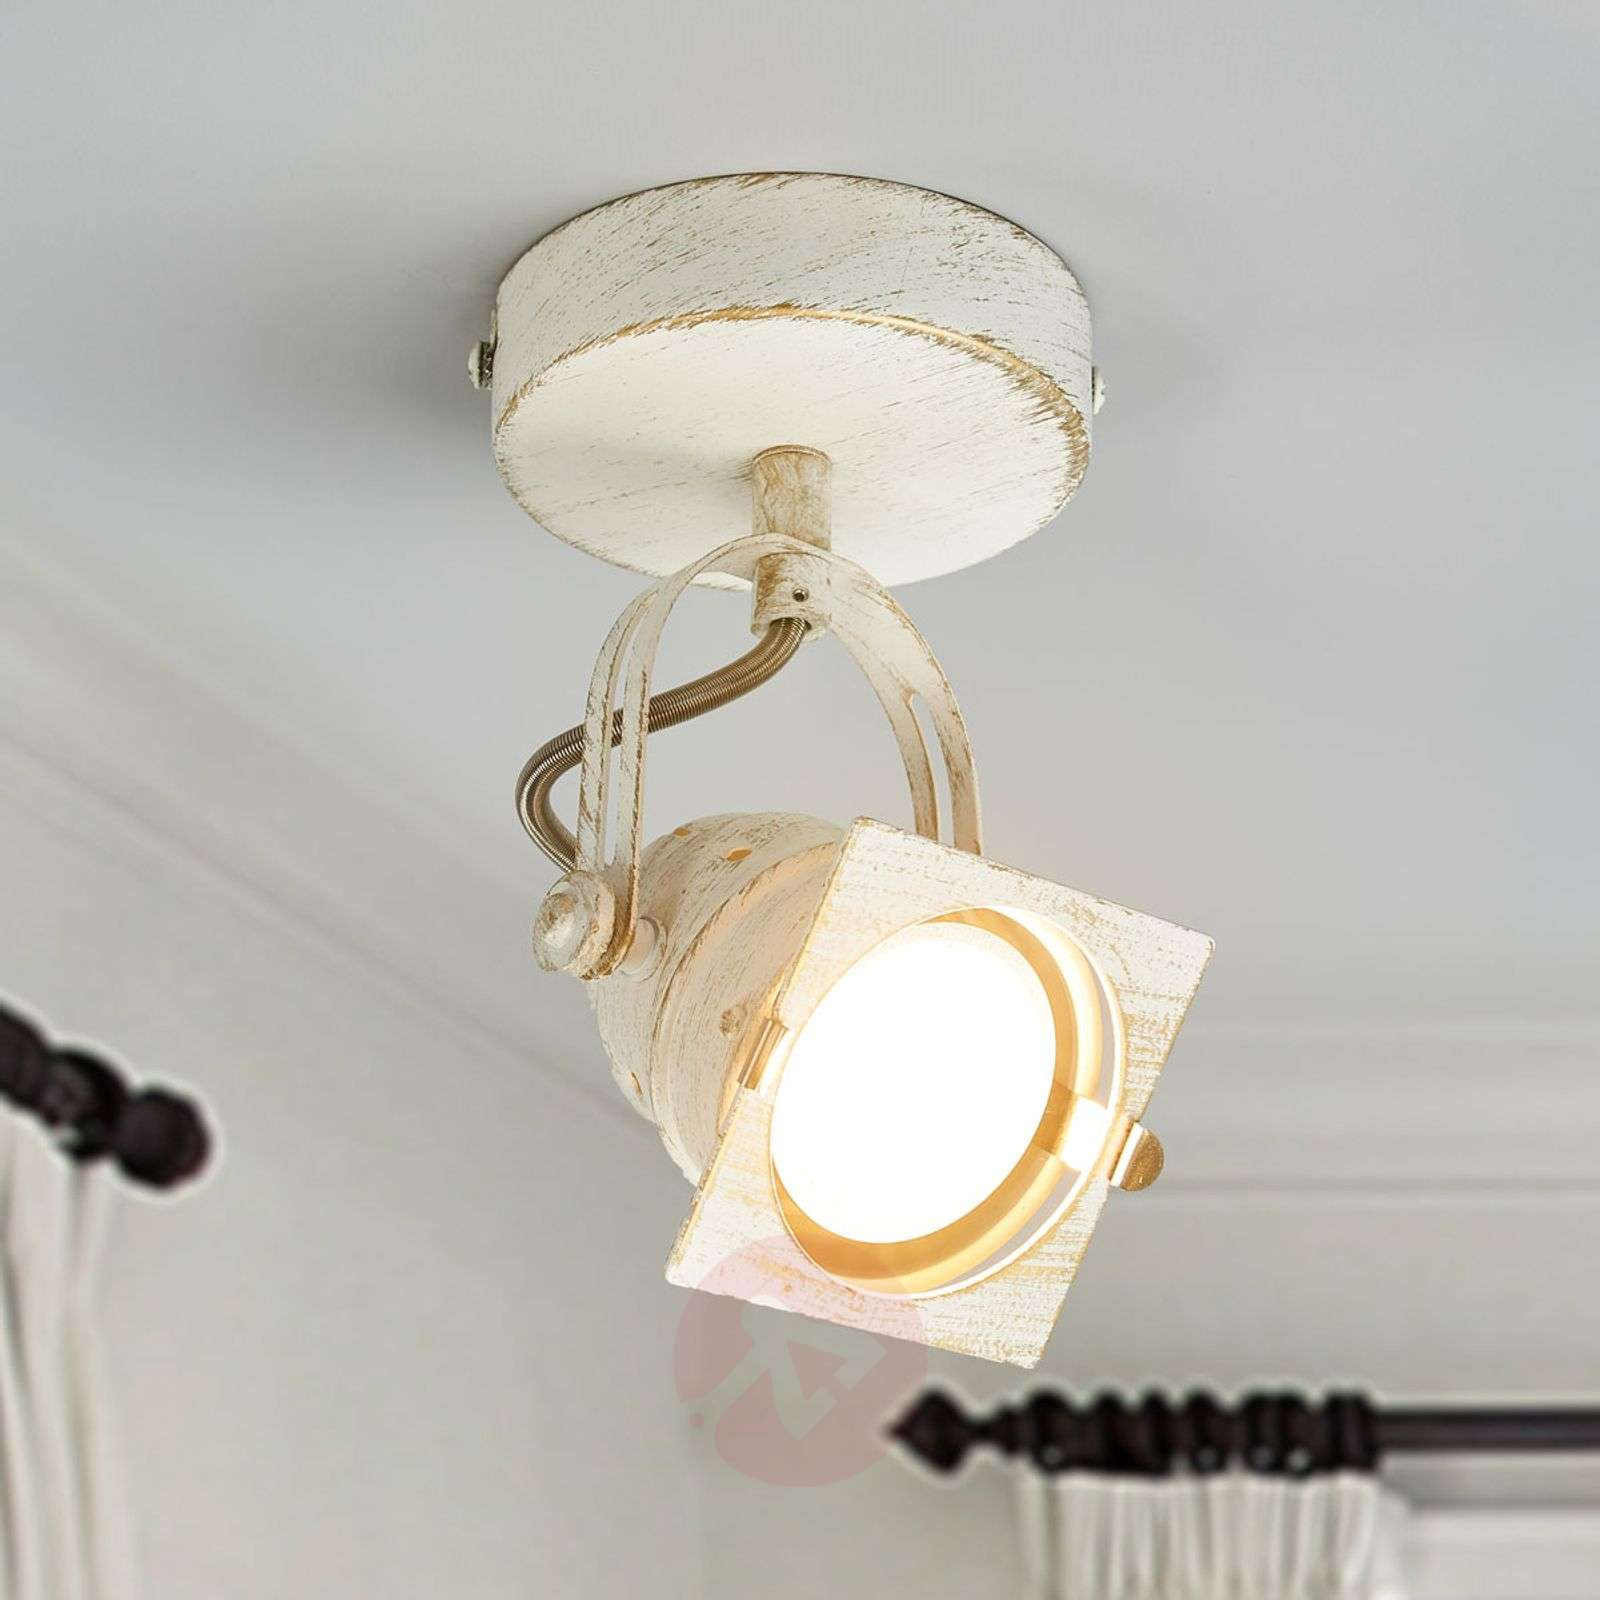 Valkoinen LED-spottivalo Janek GU10-lampulla-9639082-01